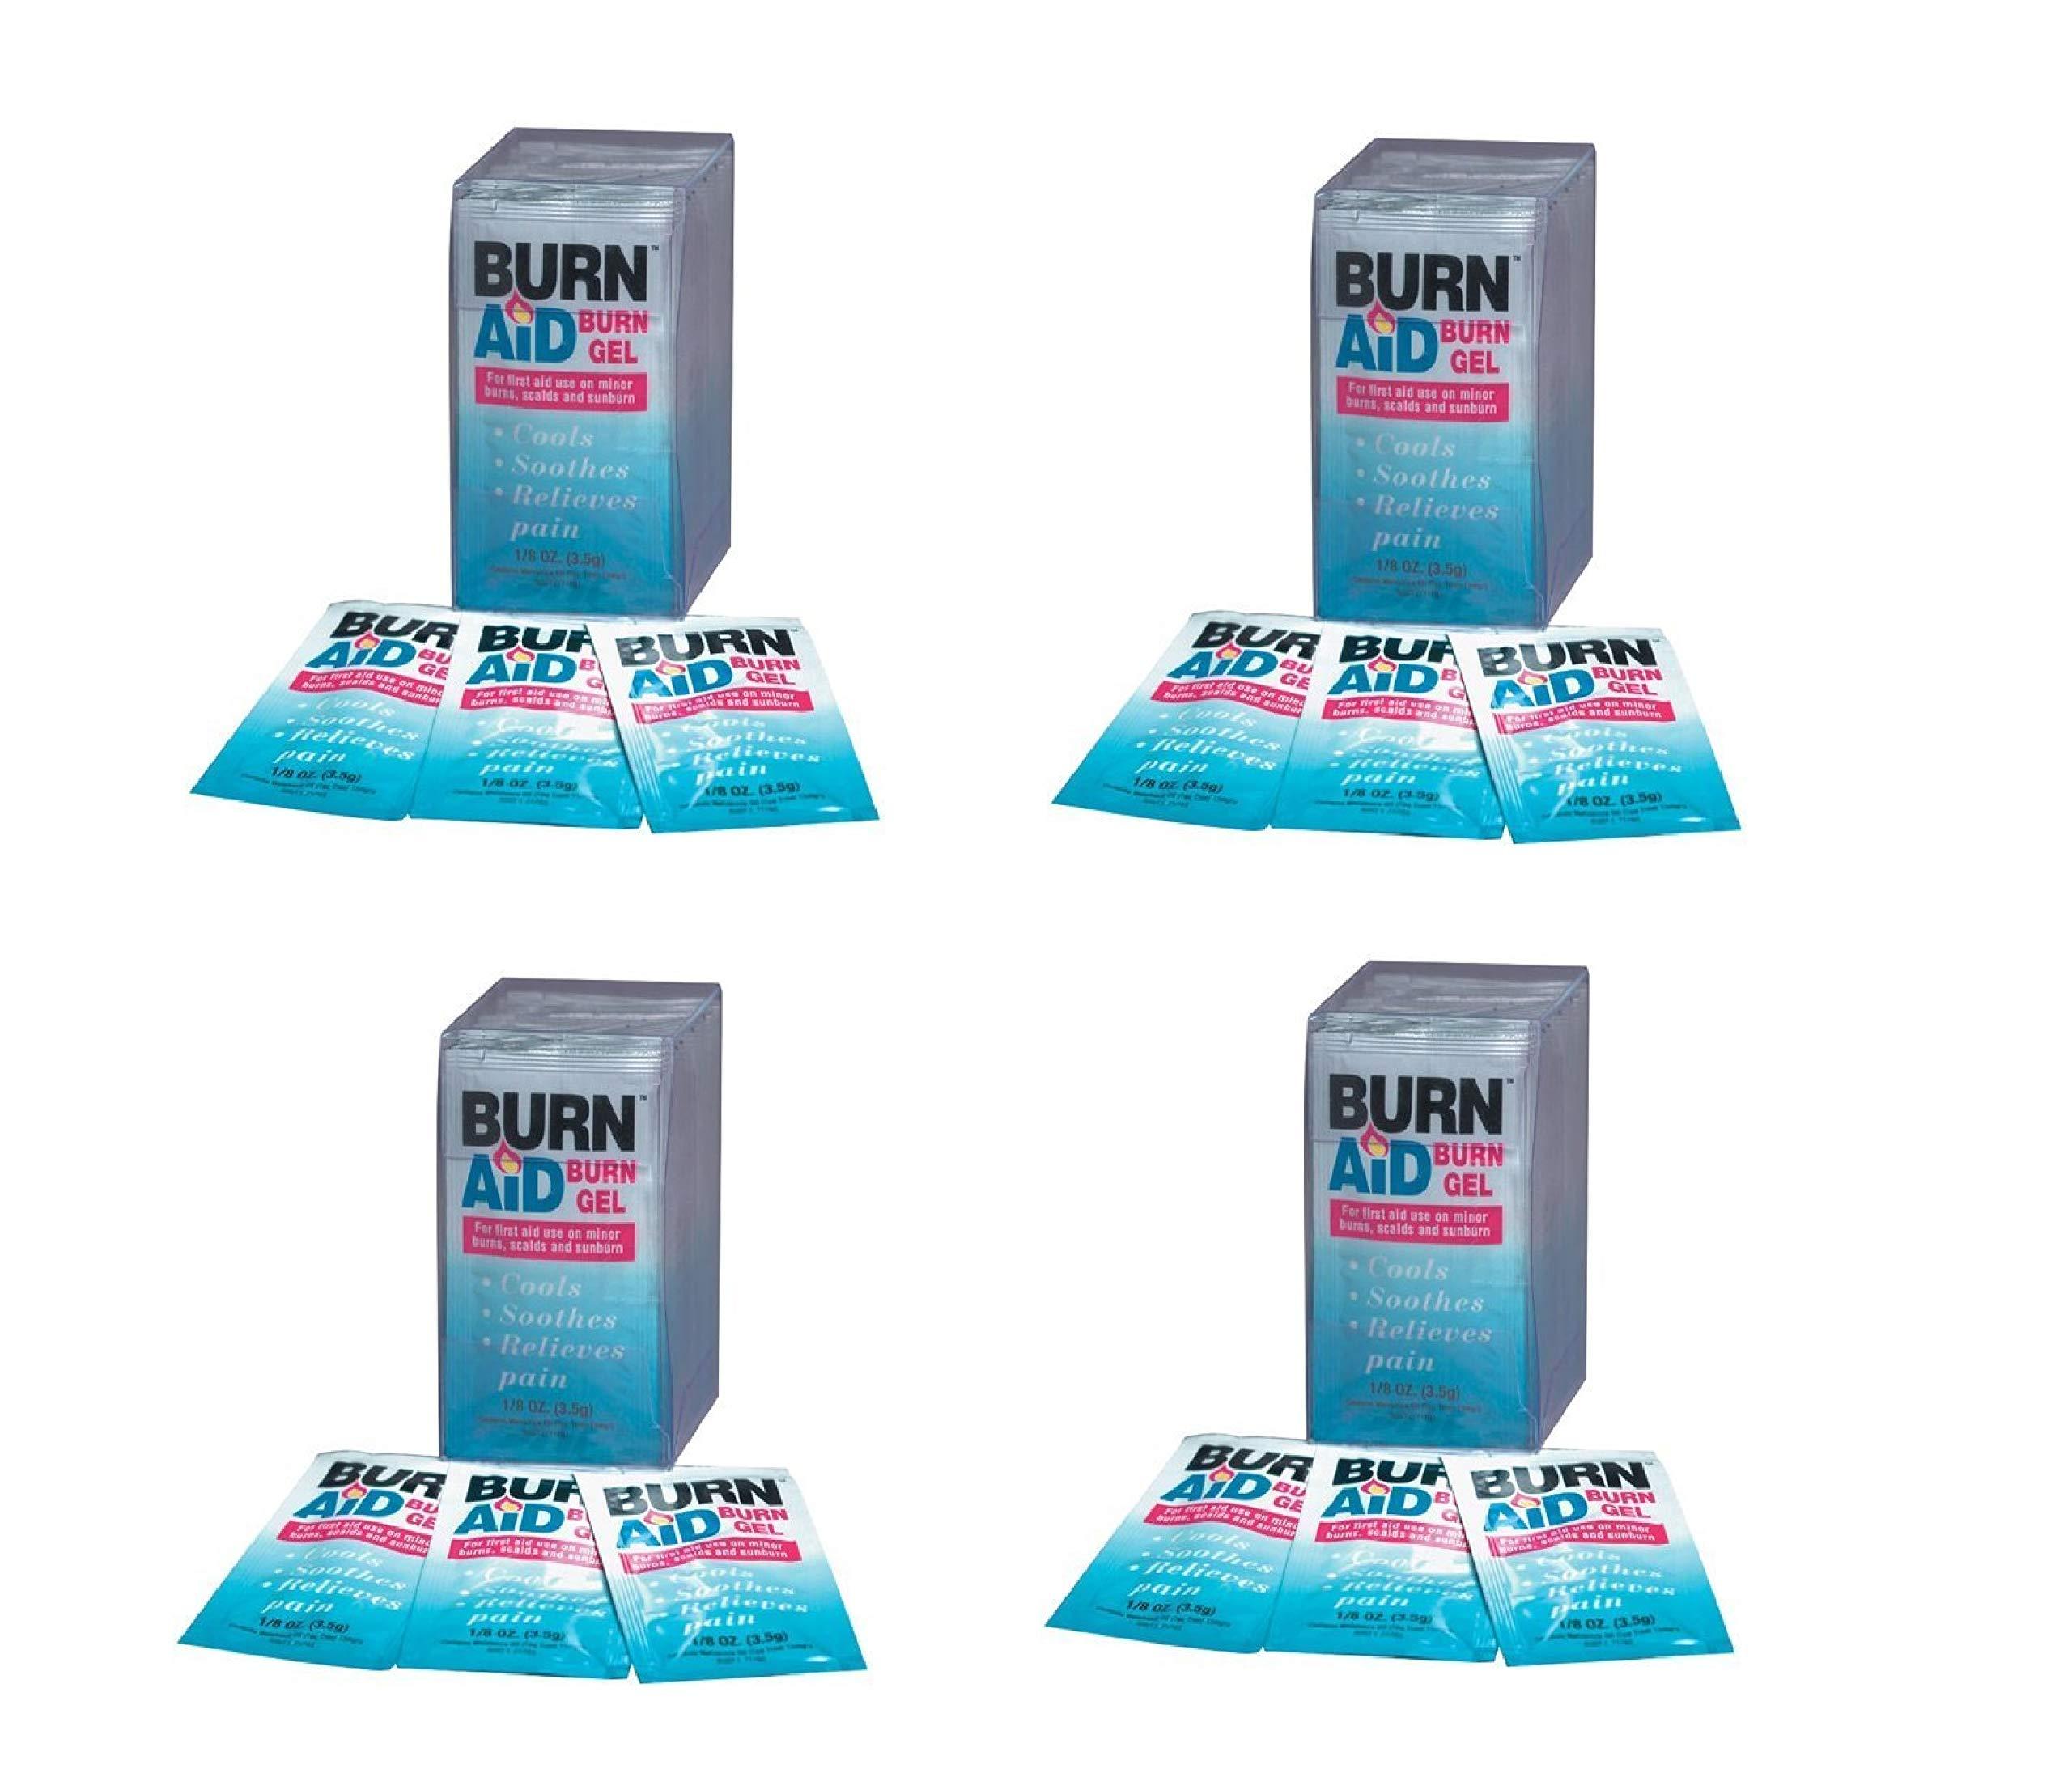 BurnAid 3-1/2-Gram Burnaid Gel Sachets, Pack of 25 (4 Pack)